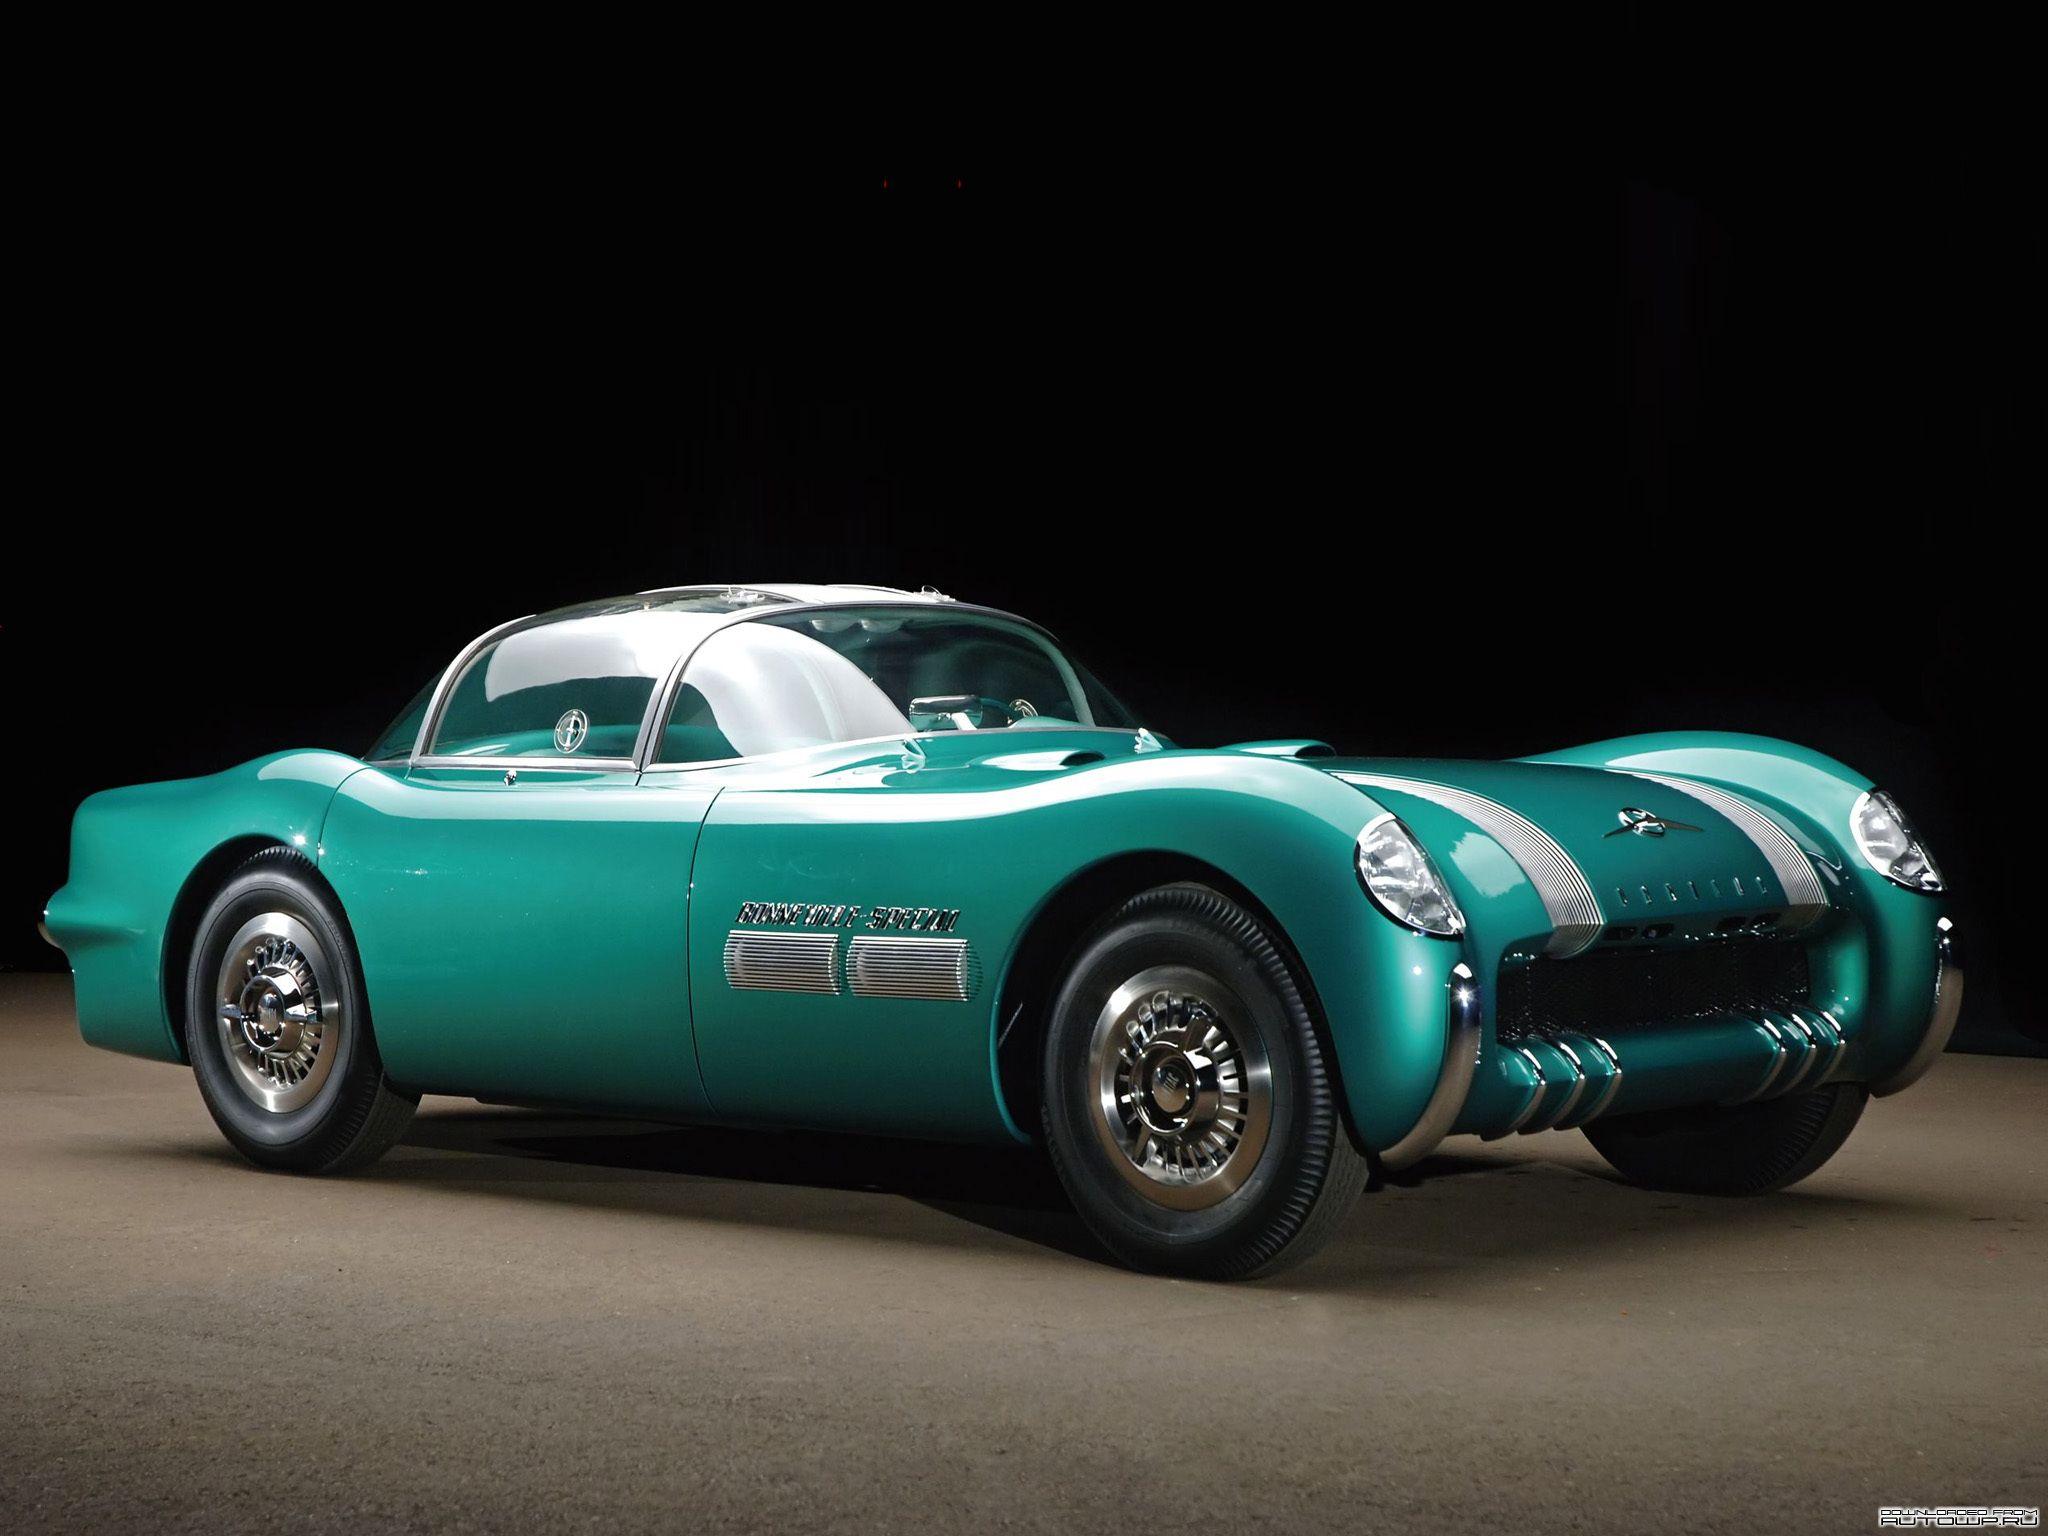 Pontiac Bonneville Concept Car 1954   Love these cars - Some fast ...